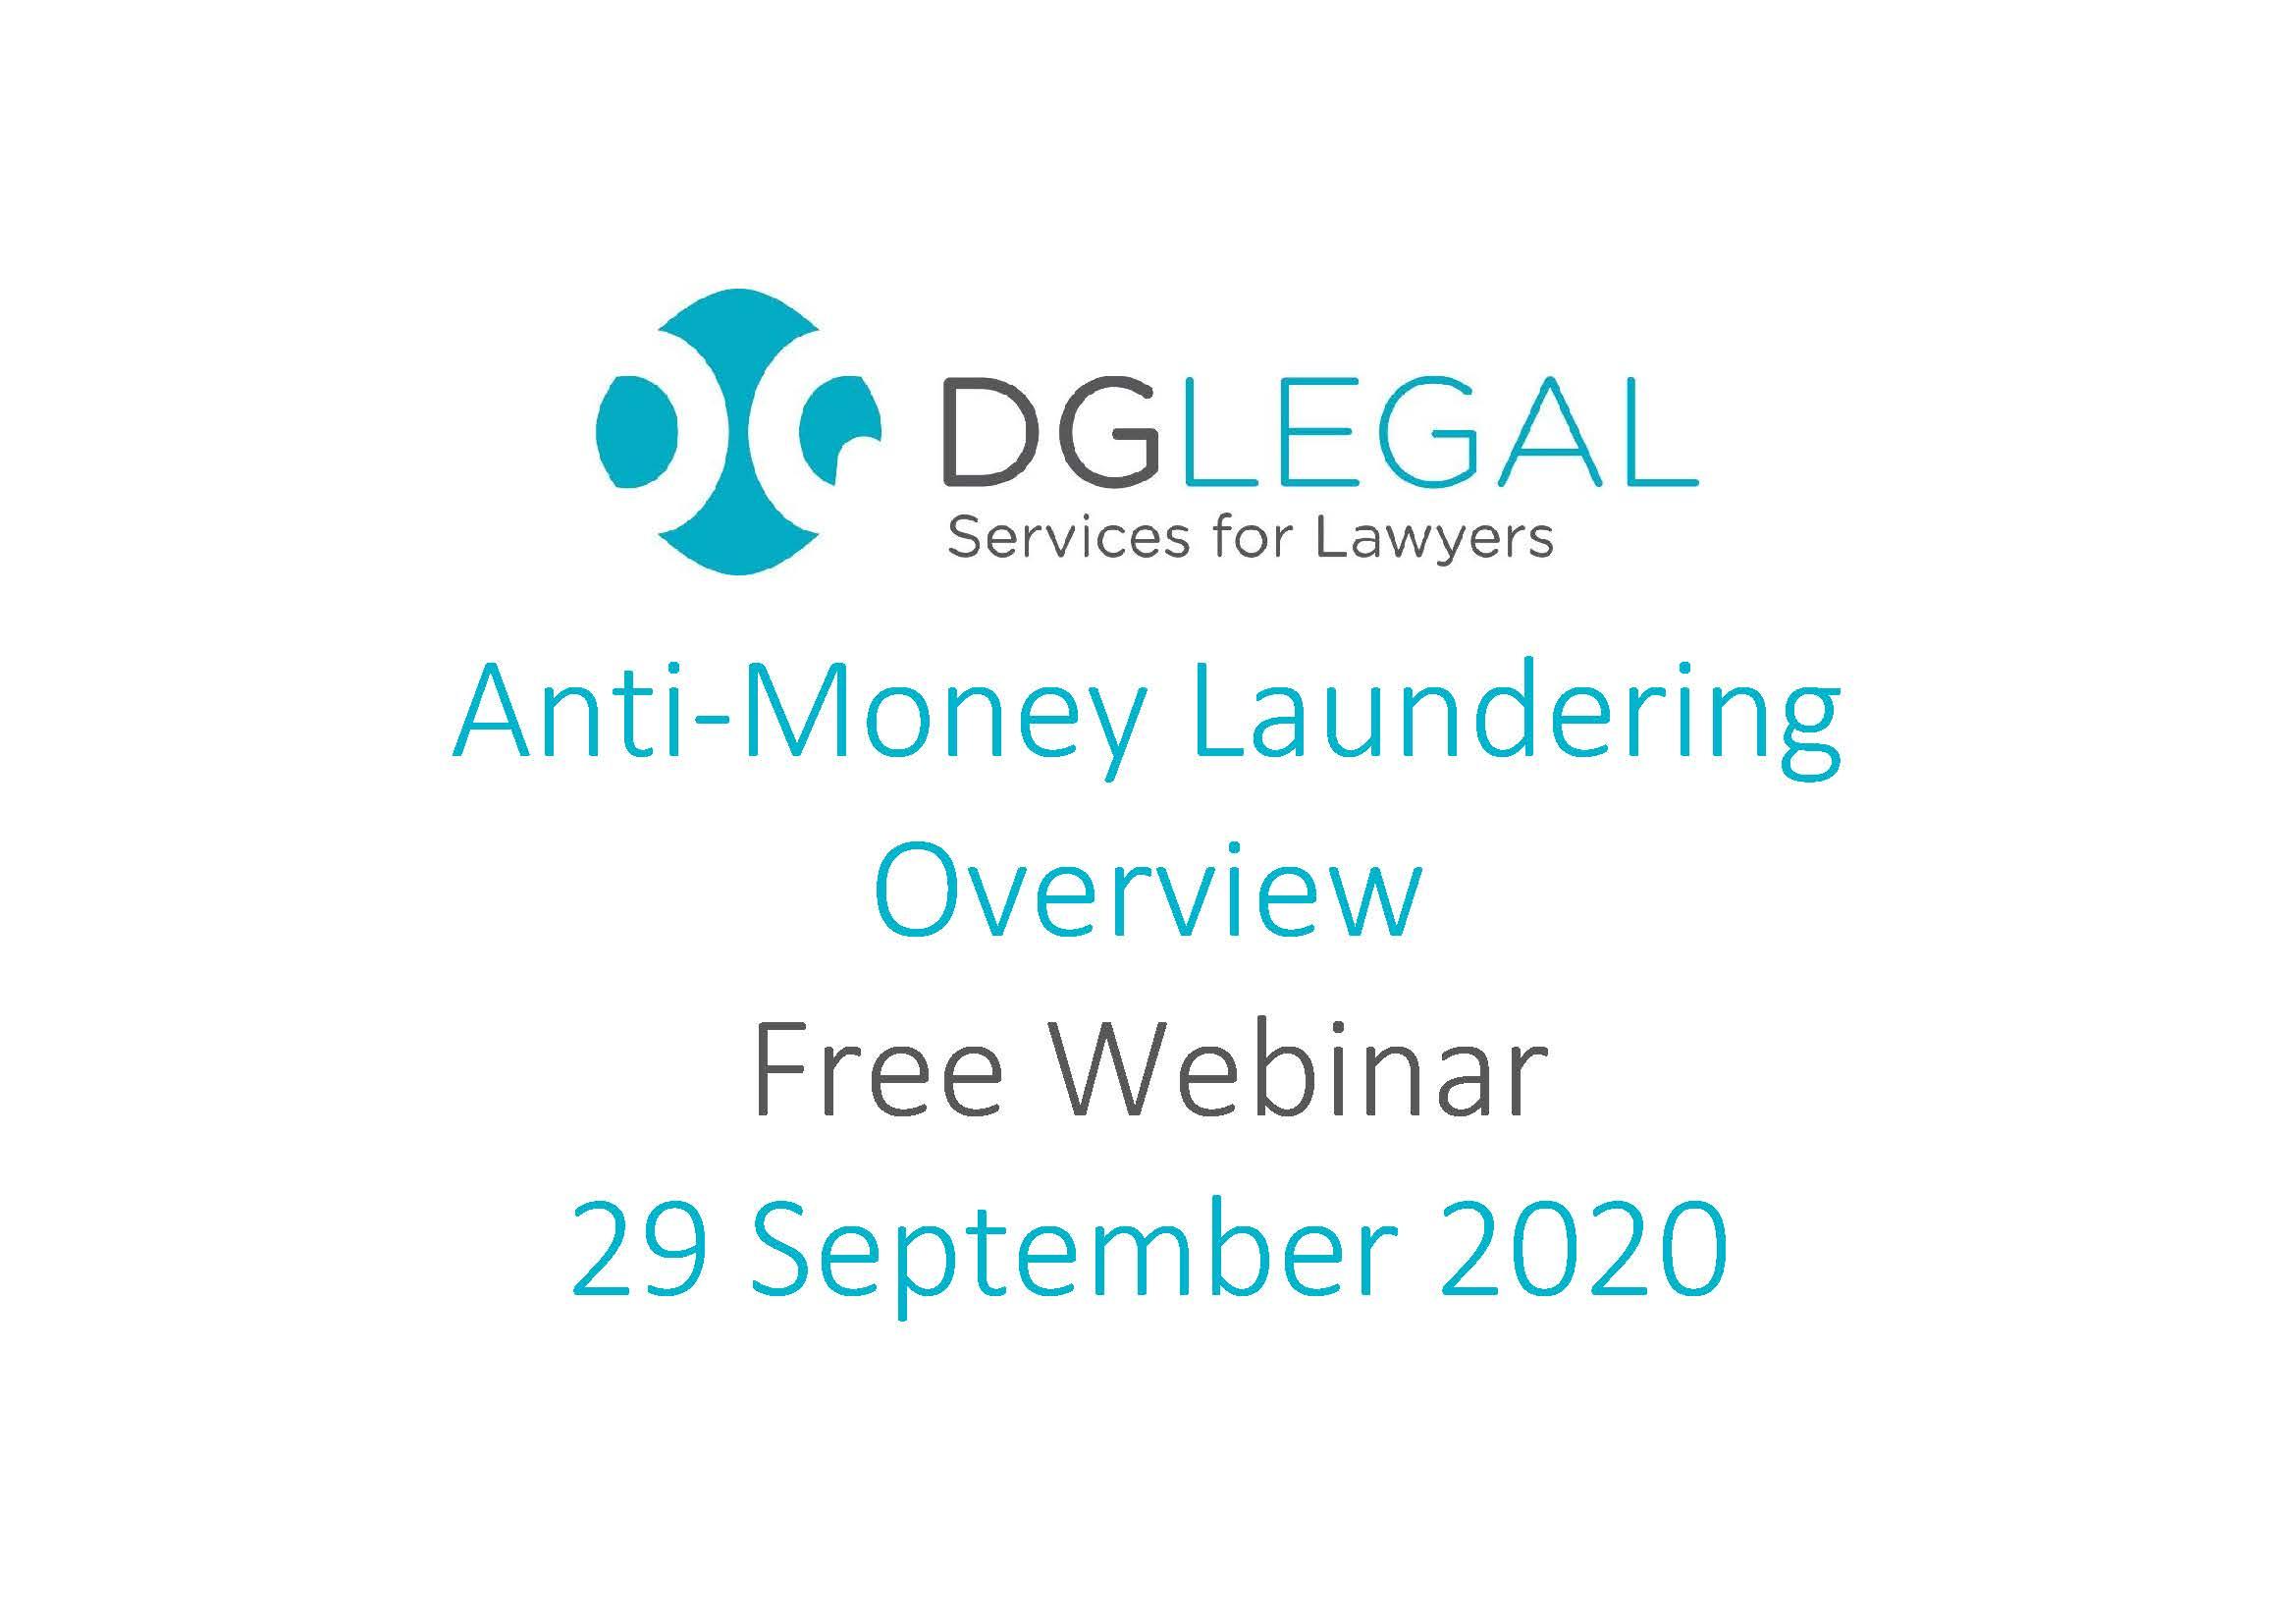 Anti-Money Laundering Overview Webinar